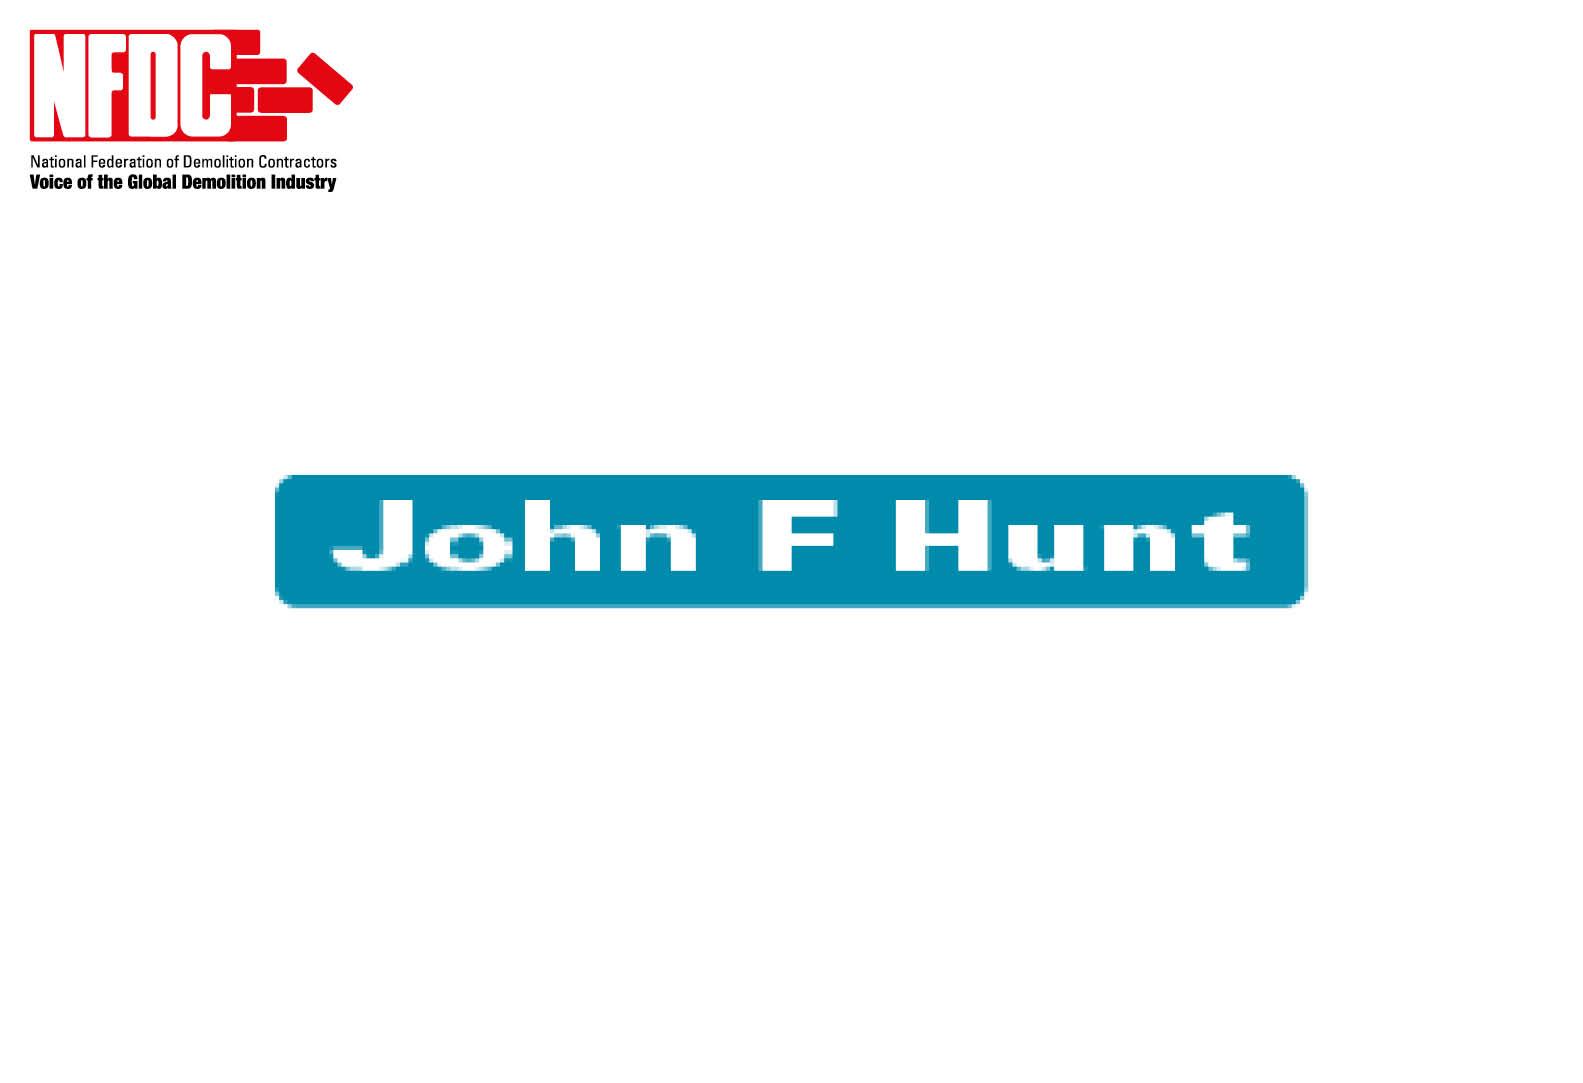 John F Hunt